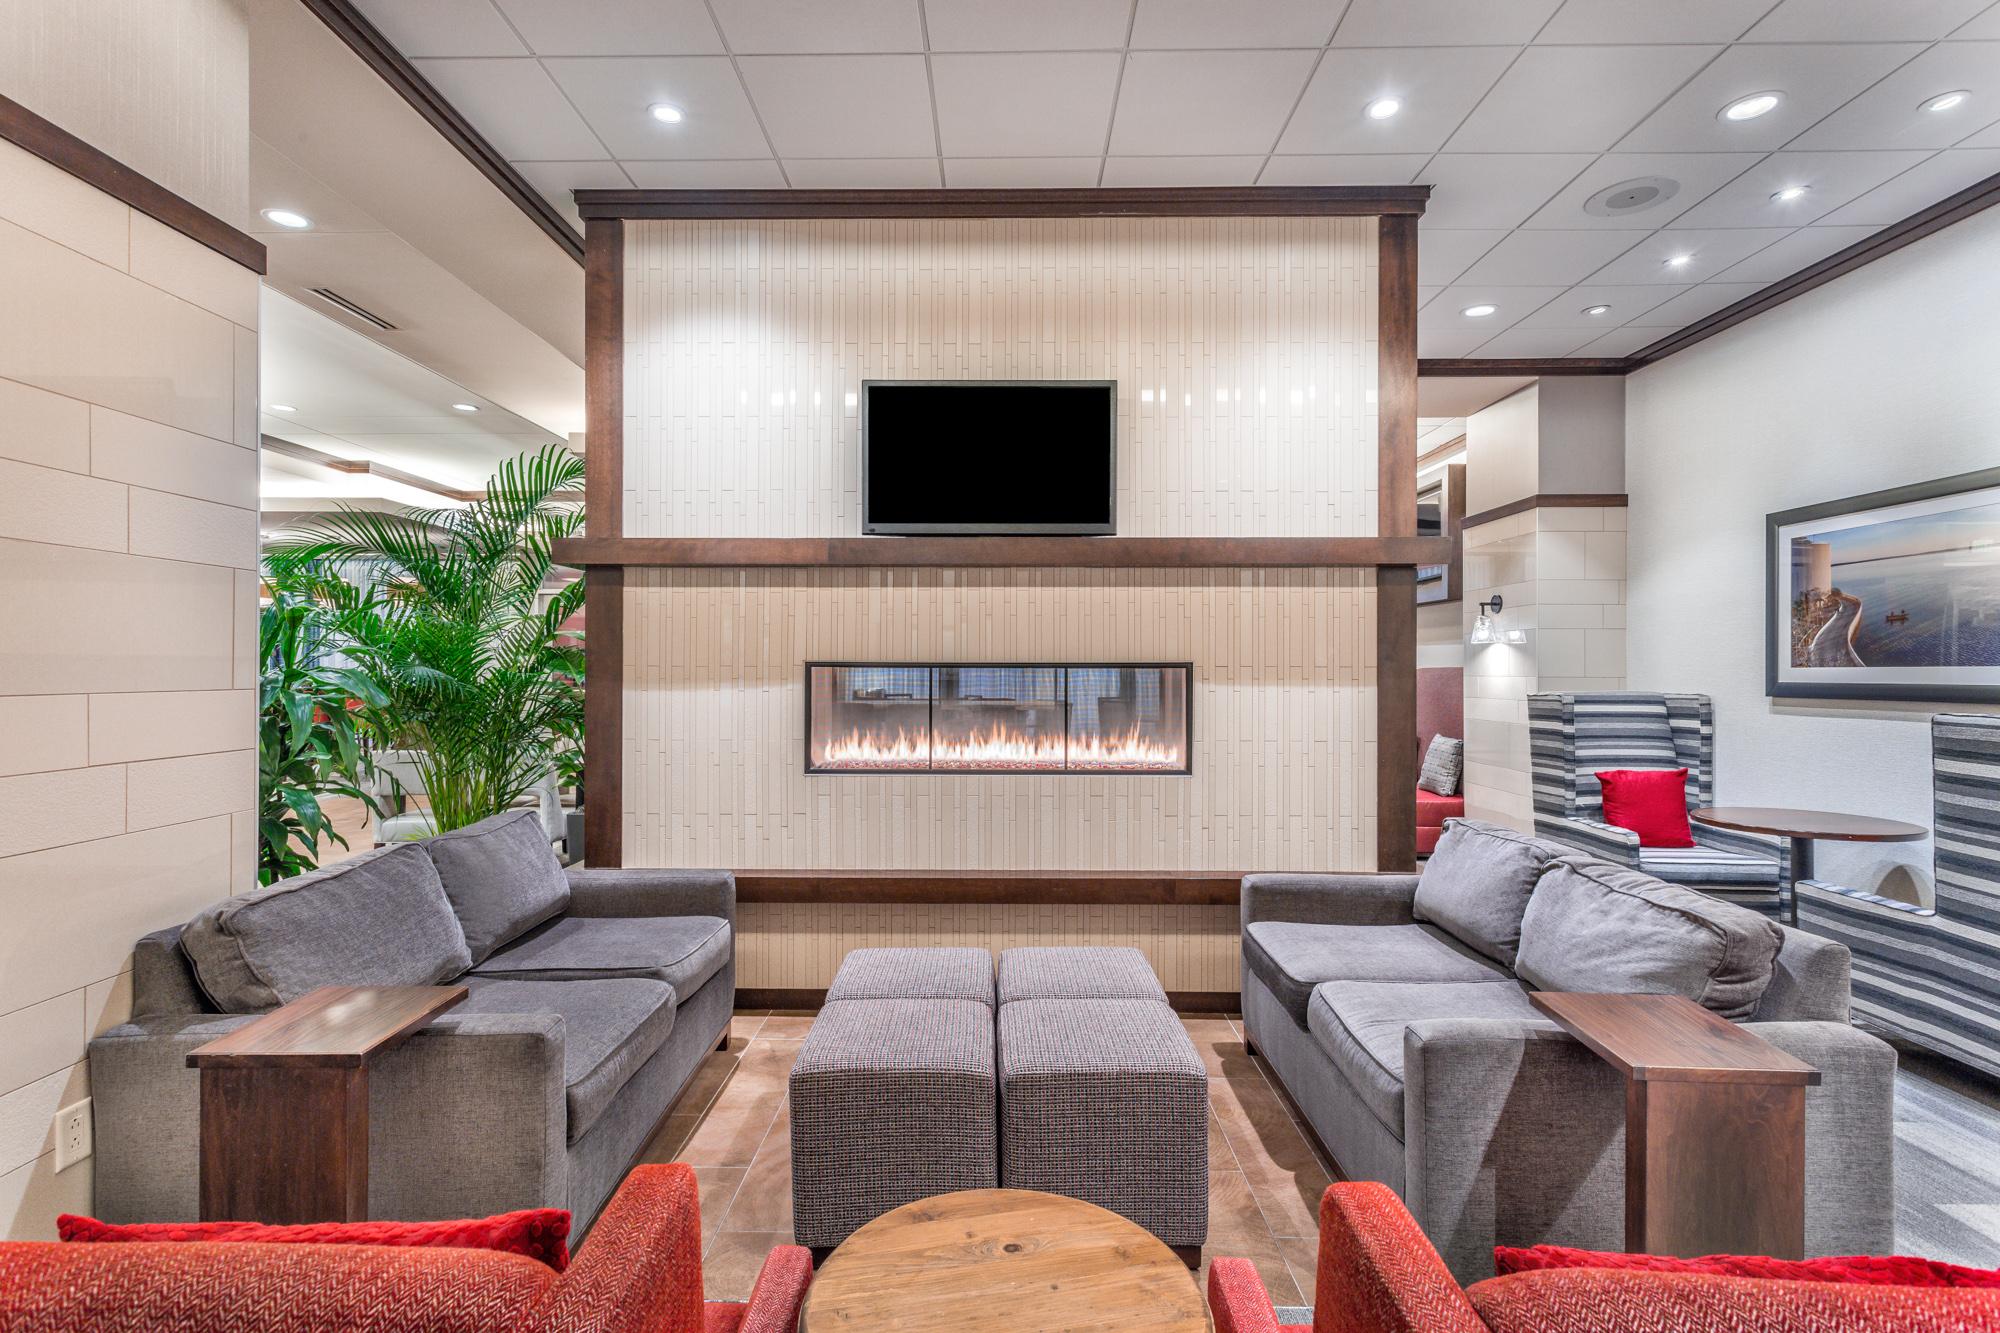 https://www.hotelsbyday.com/_data/default-hotel_image/2/13100/hampton-inn-msnbjhx-downtown-madison-wi-lobby-lounge-area-9935-low-res.jpg